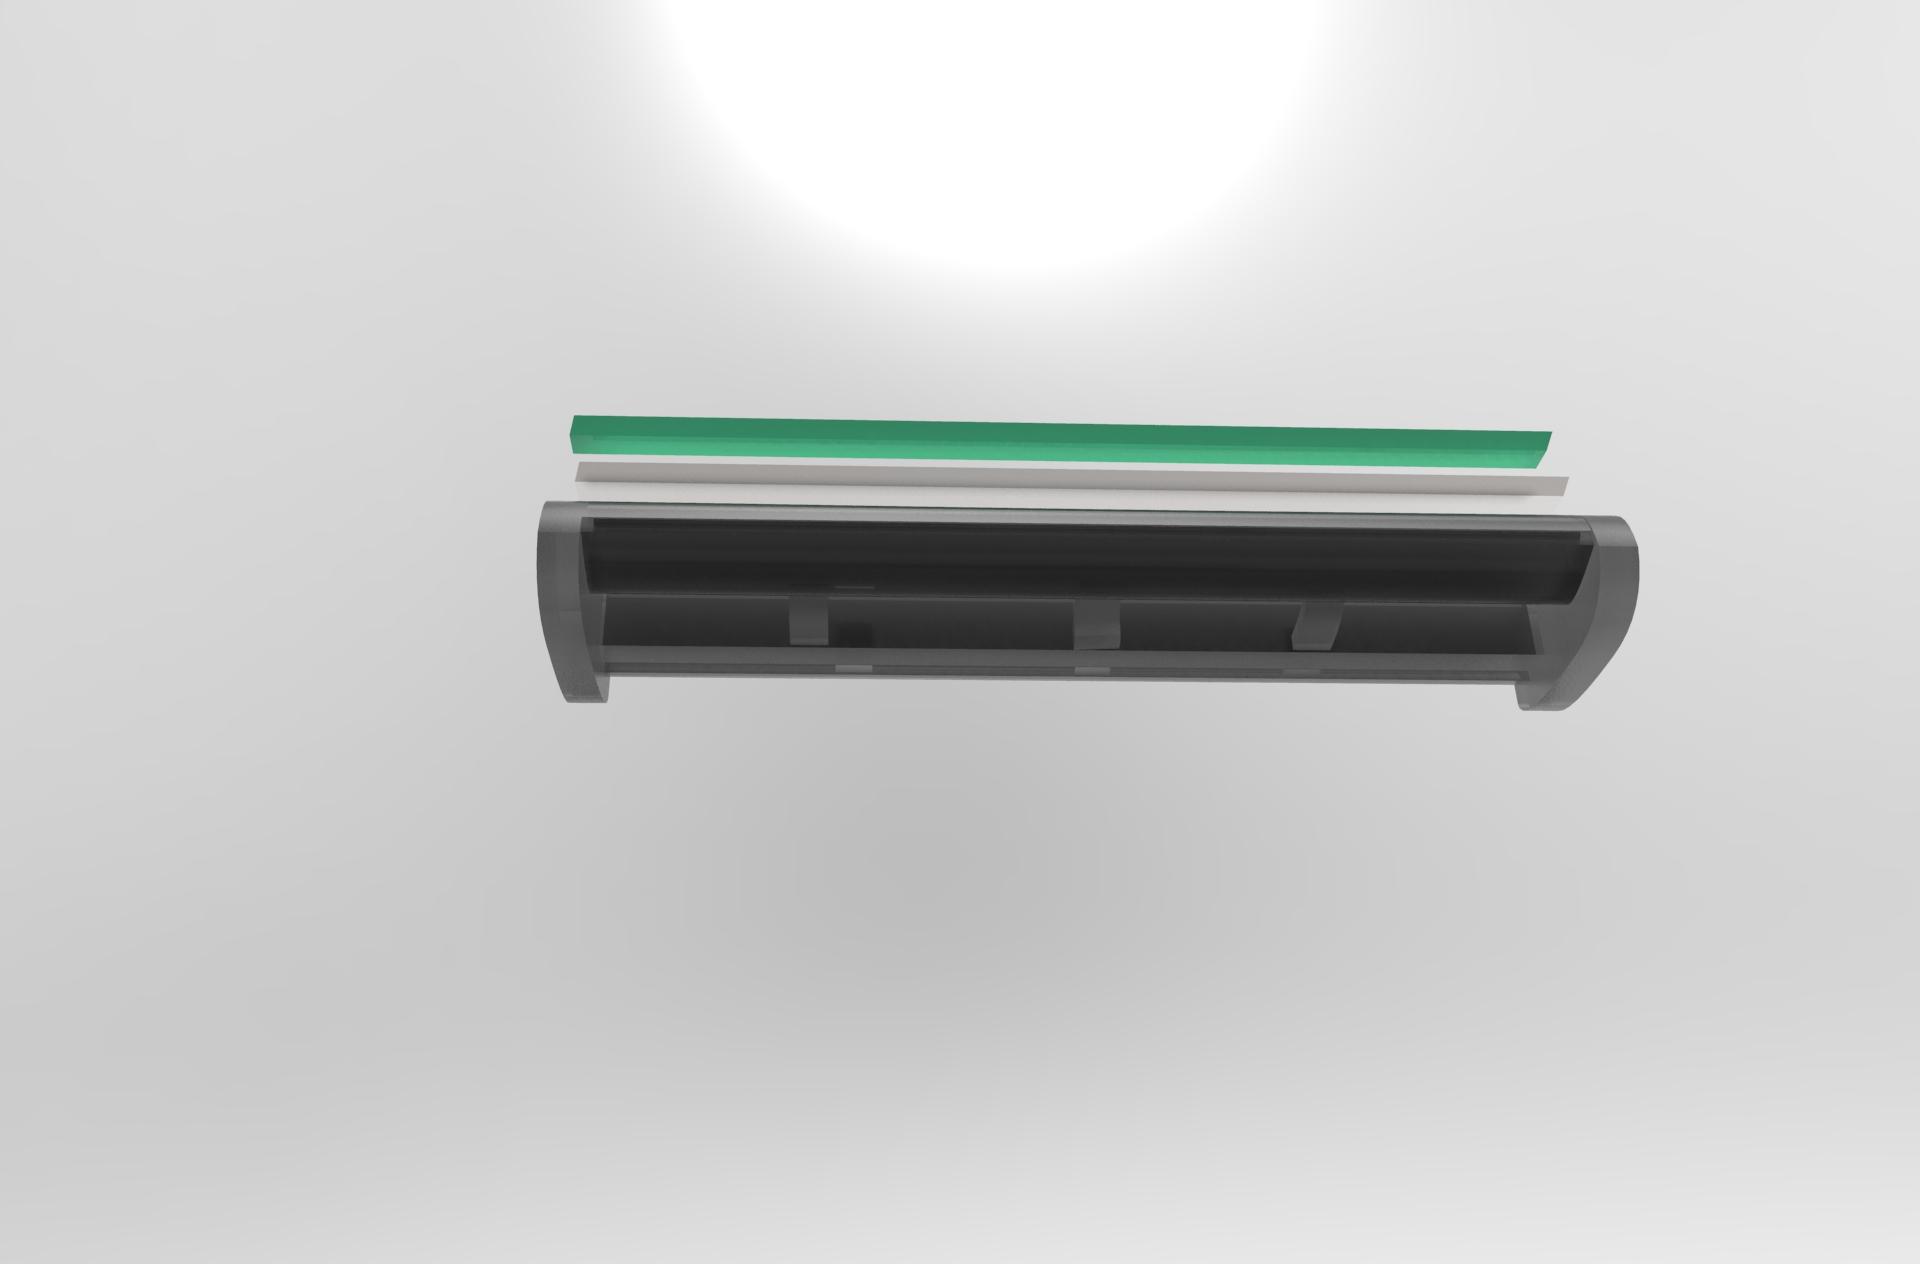 Manual razor 3D model industrial design